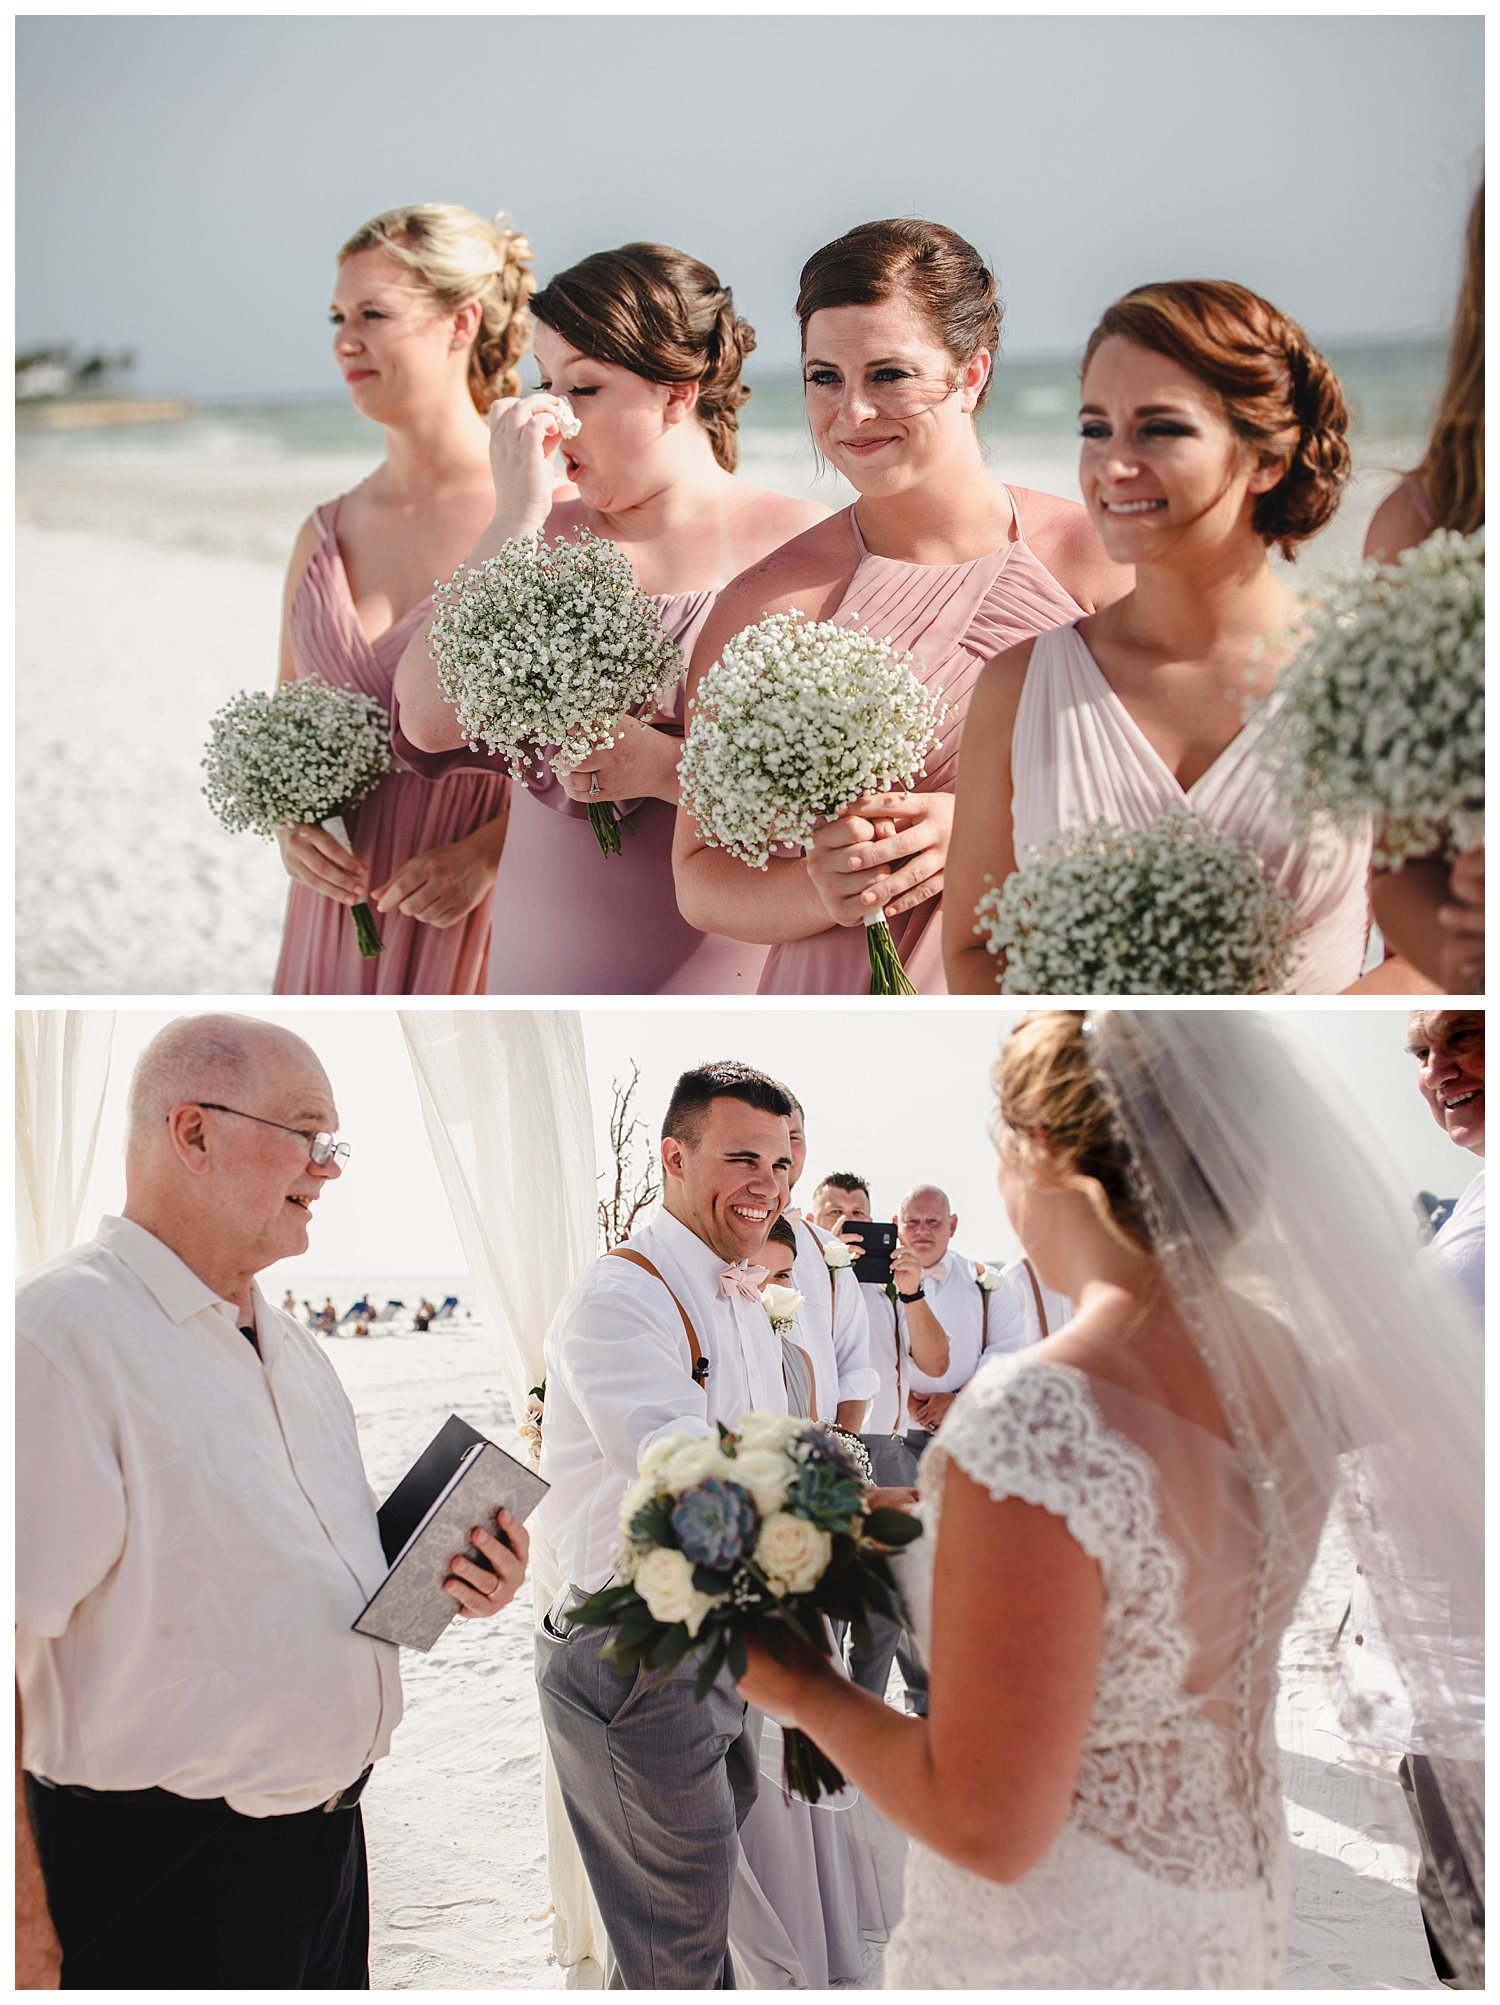 Kelsey_Diane_Photography_Destination_Wedding_Sarasota_Florida_Beach_Wedding_Alex_Austin_0646.jpg